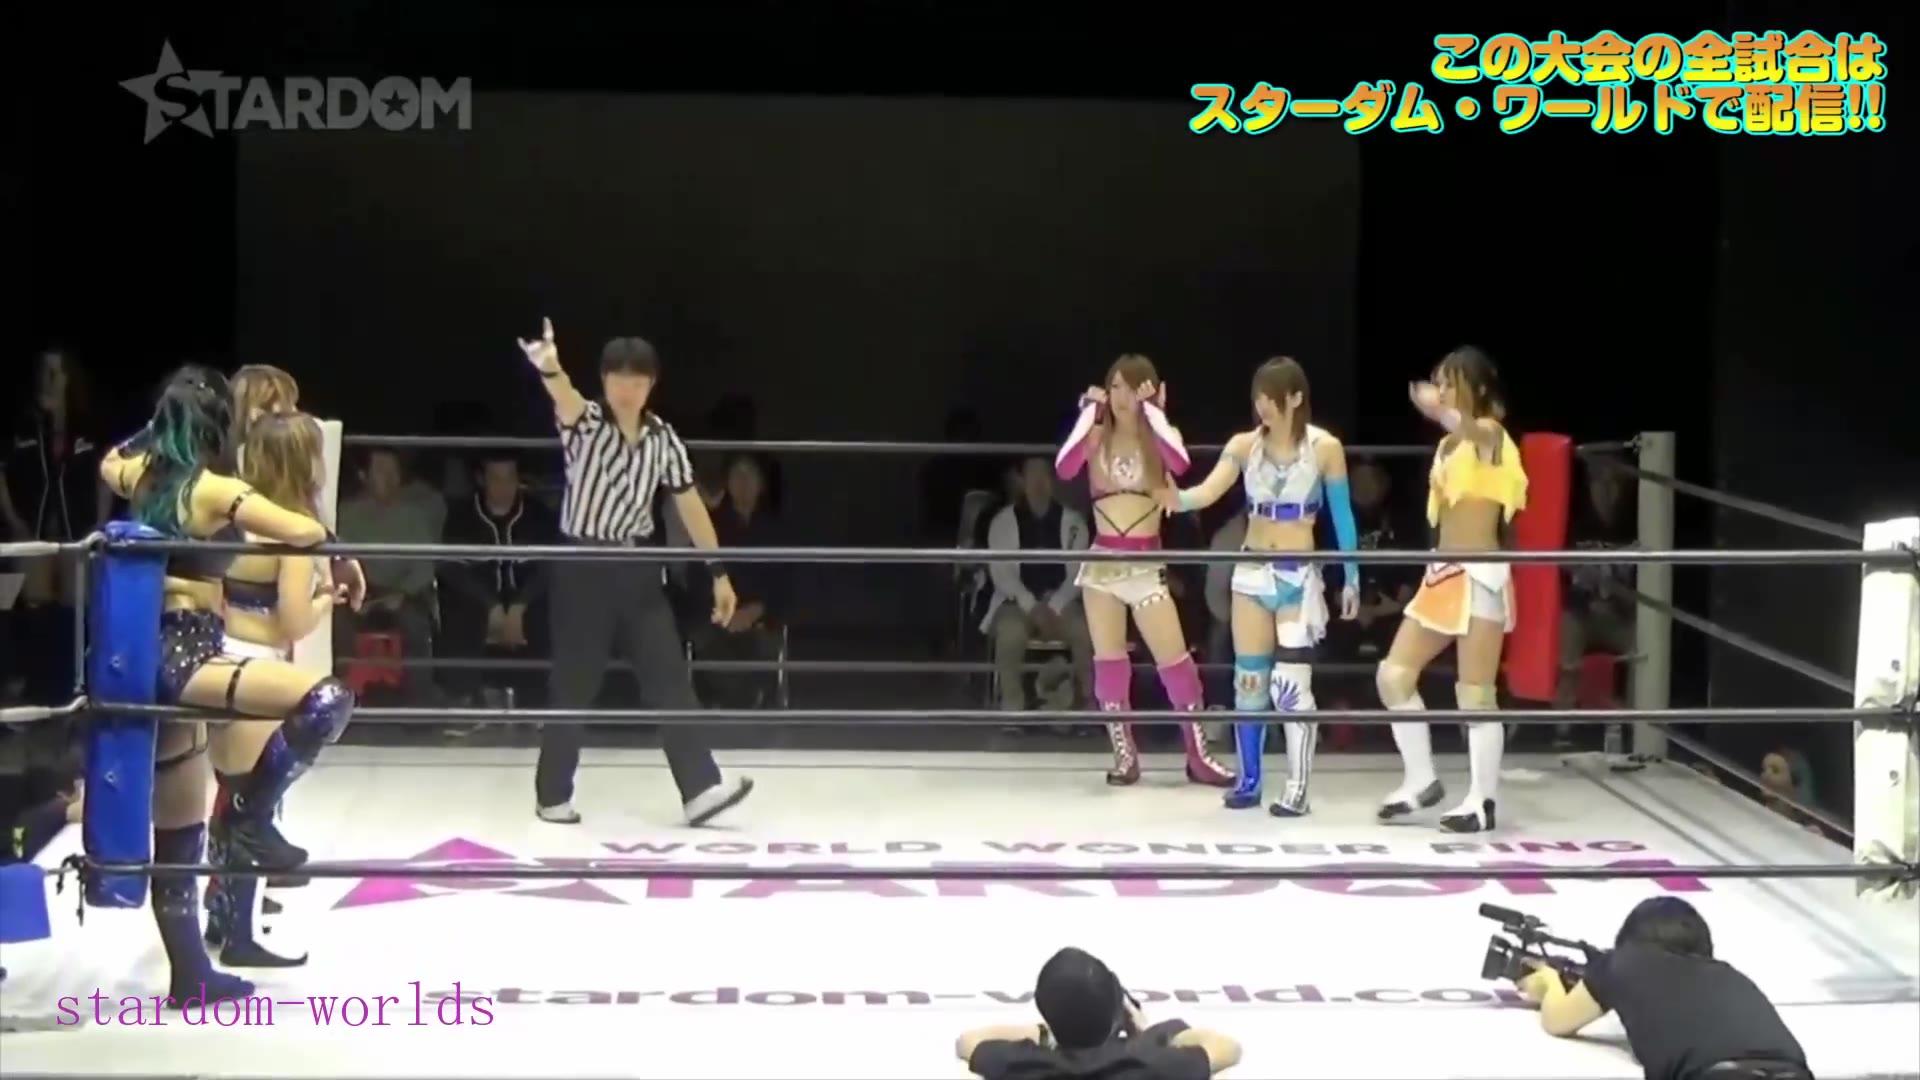 日本女子摔角Stardom-2019.3.21岩谷麻優,星輝ありさ,鹿島沙希vs渡辺桃,林下詩美,.